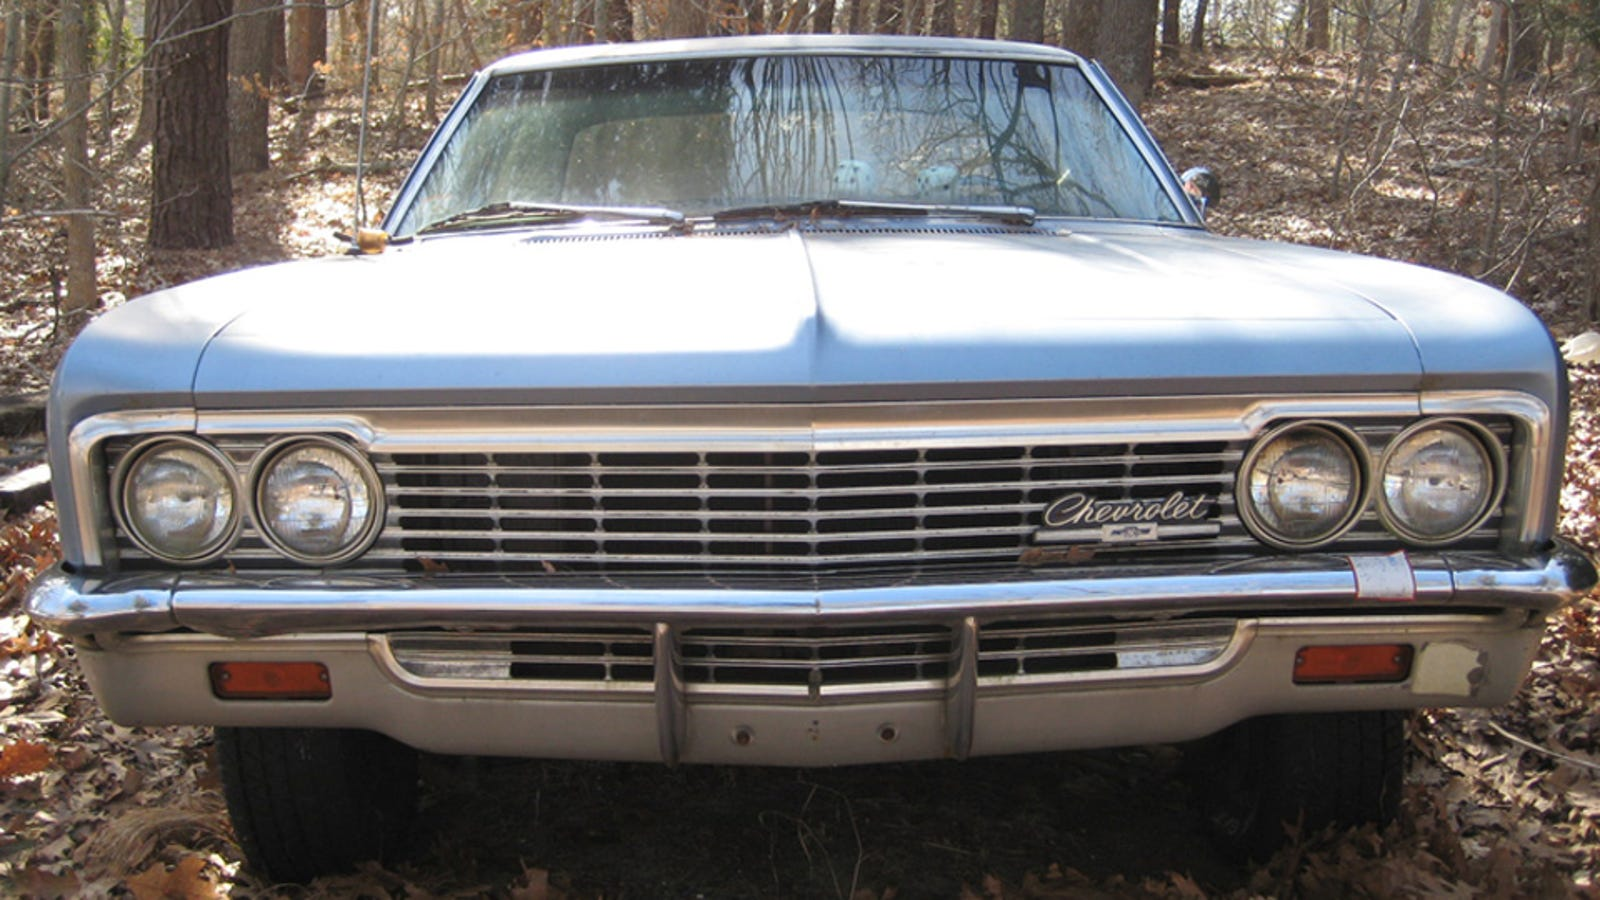 1966 Chevrolet Bel Air Caprice Clic